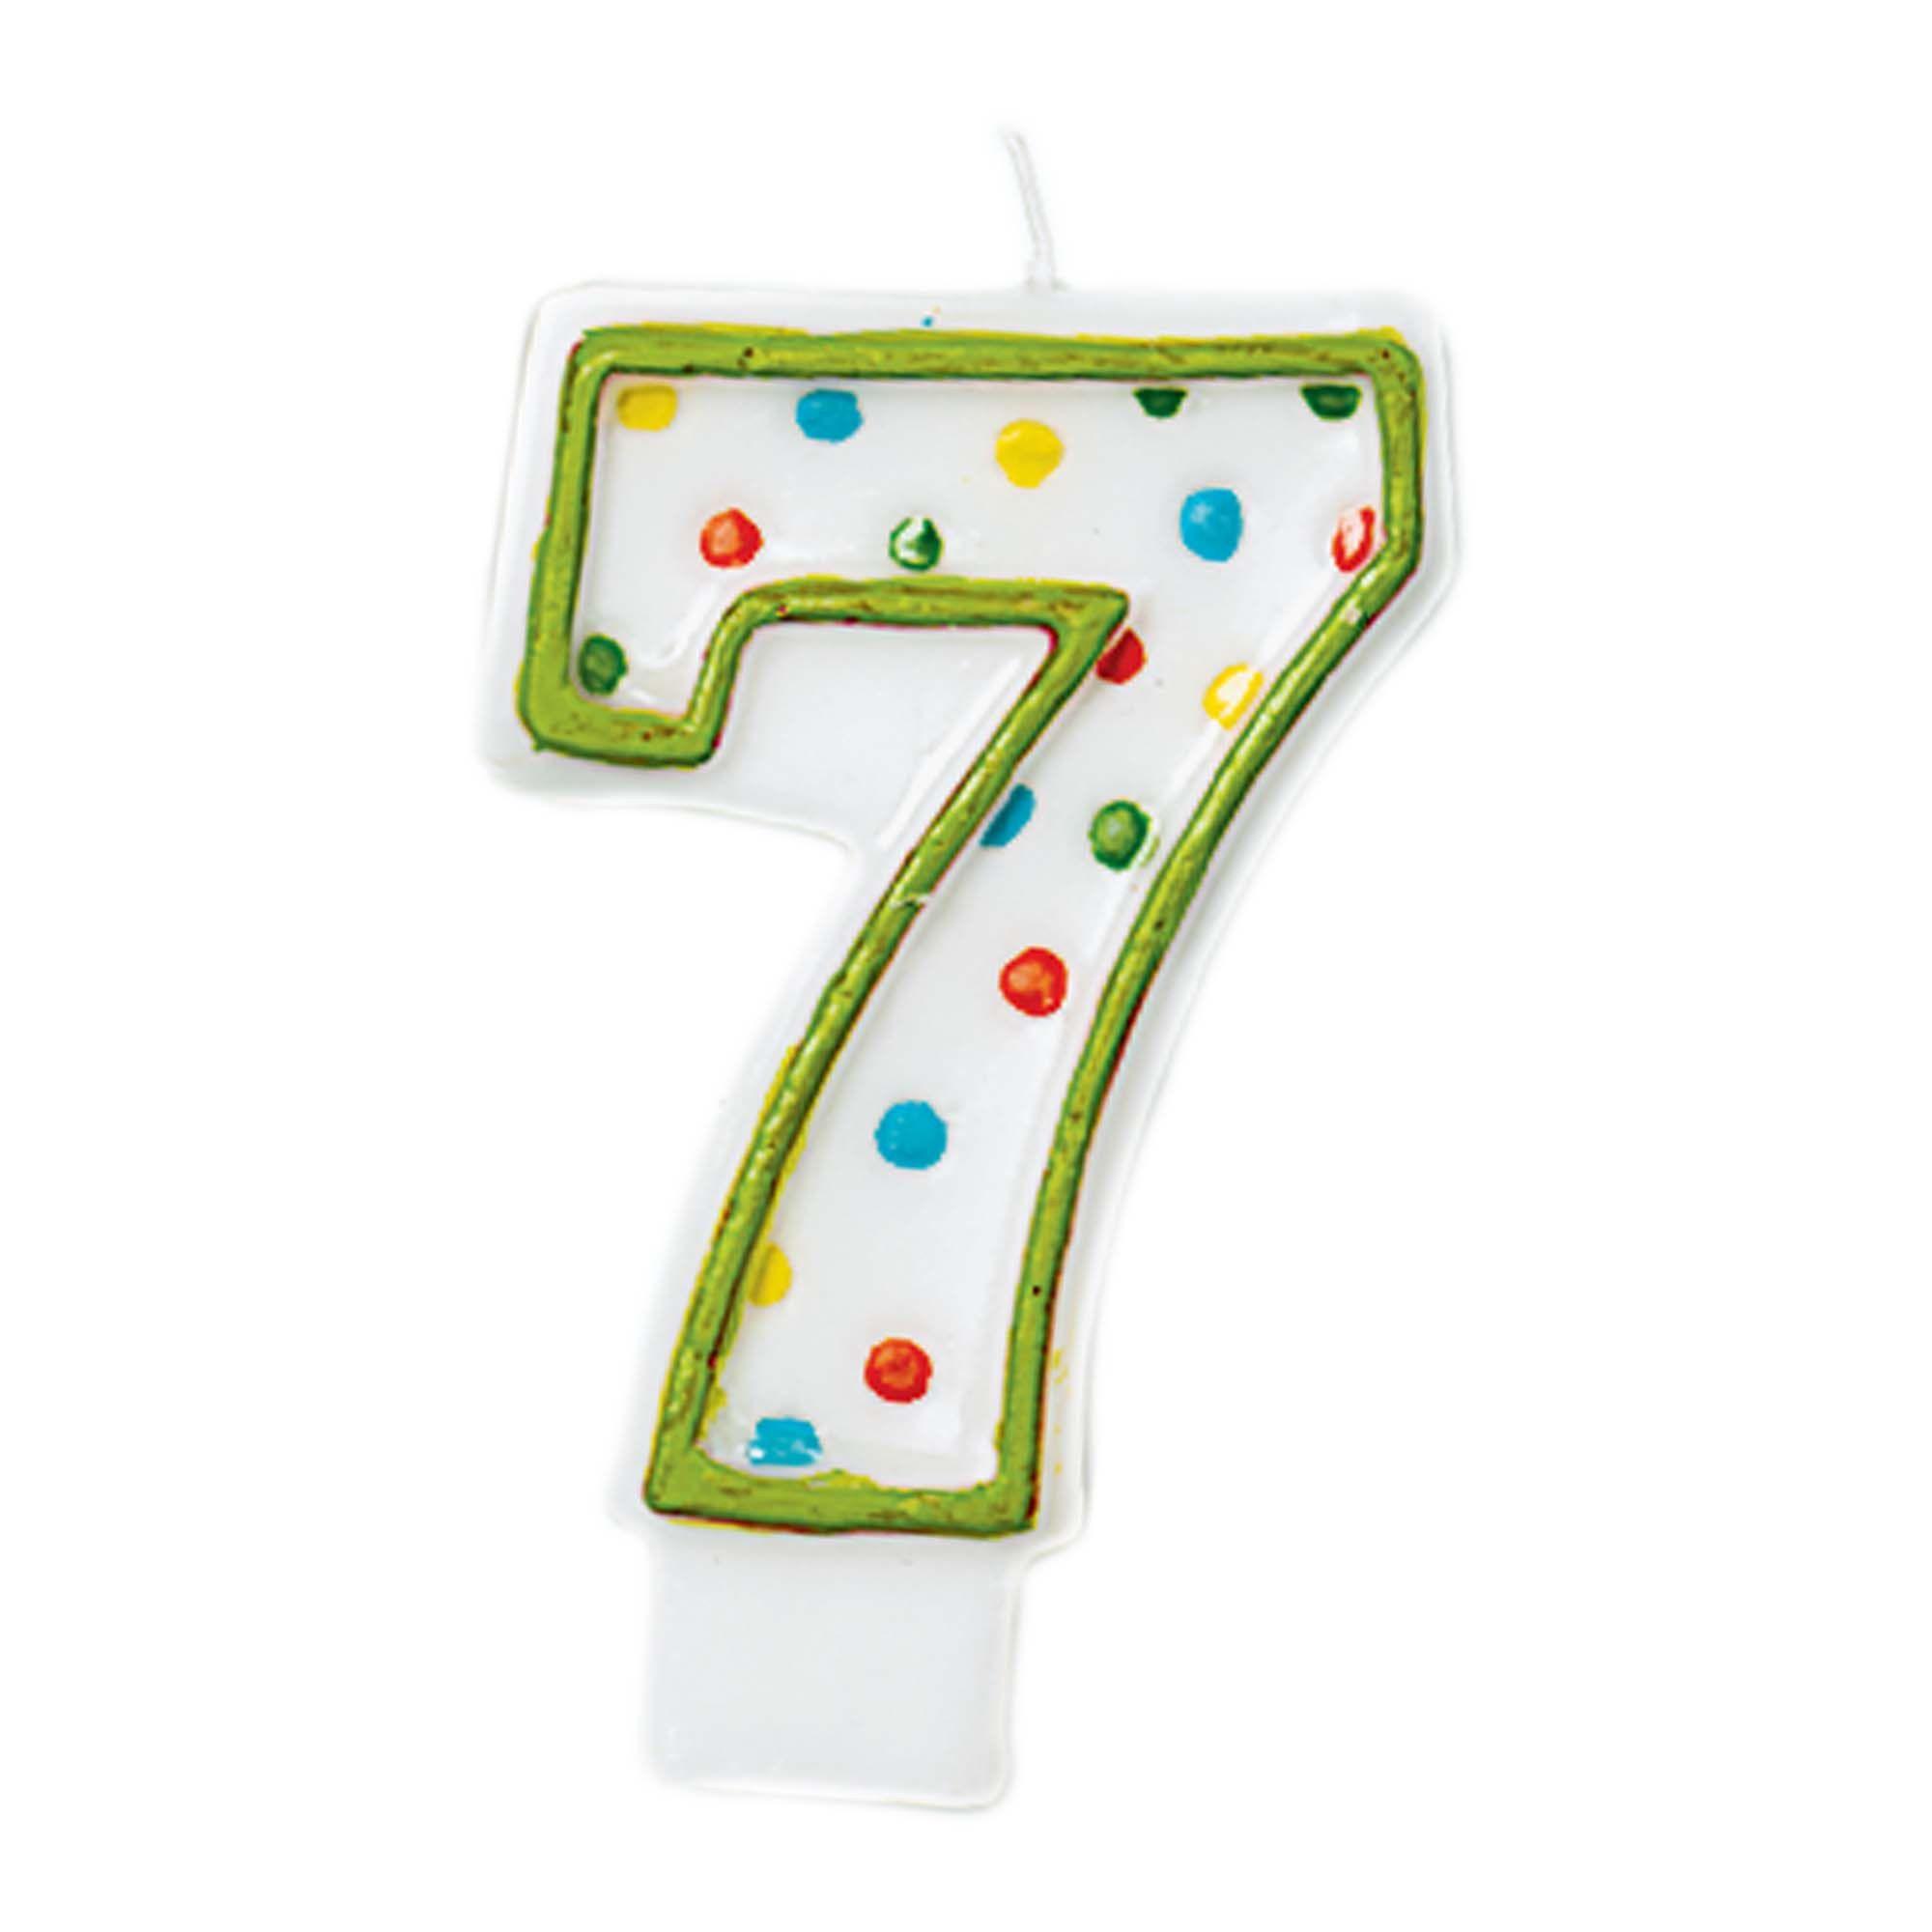 #7 Polka Dot Candle